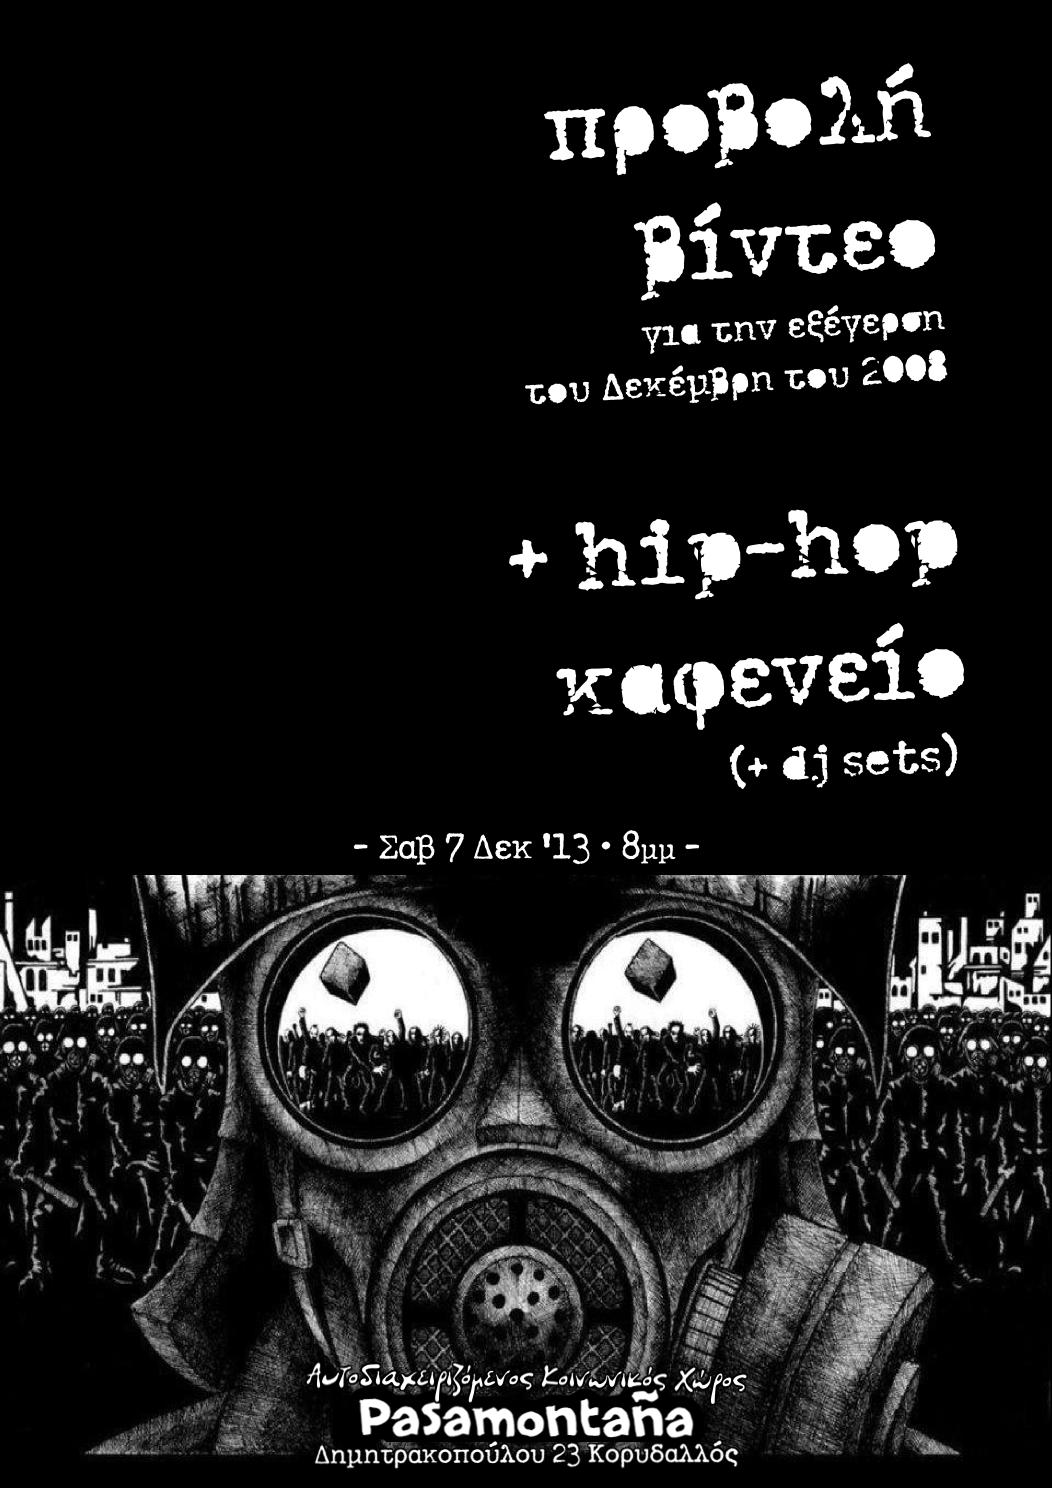 Hip hop καφενειο // Δεκεμβρης '08 (12/'13)